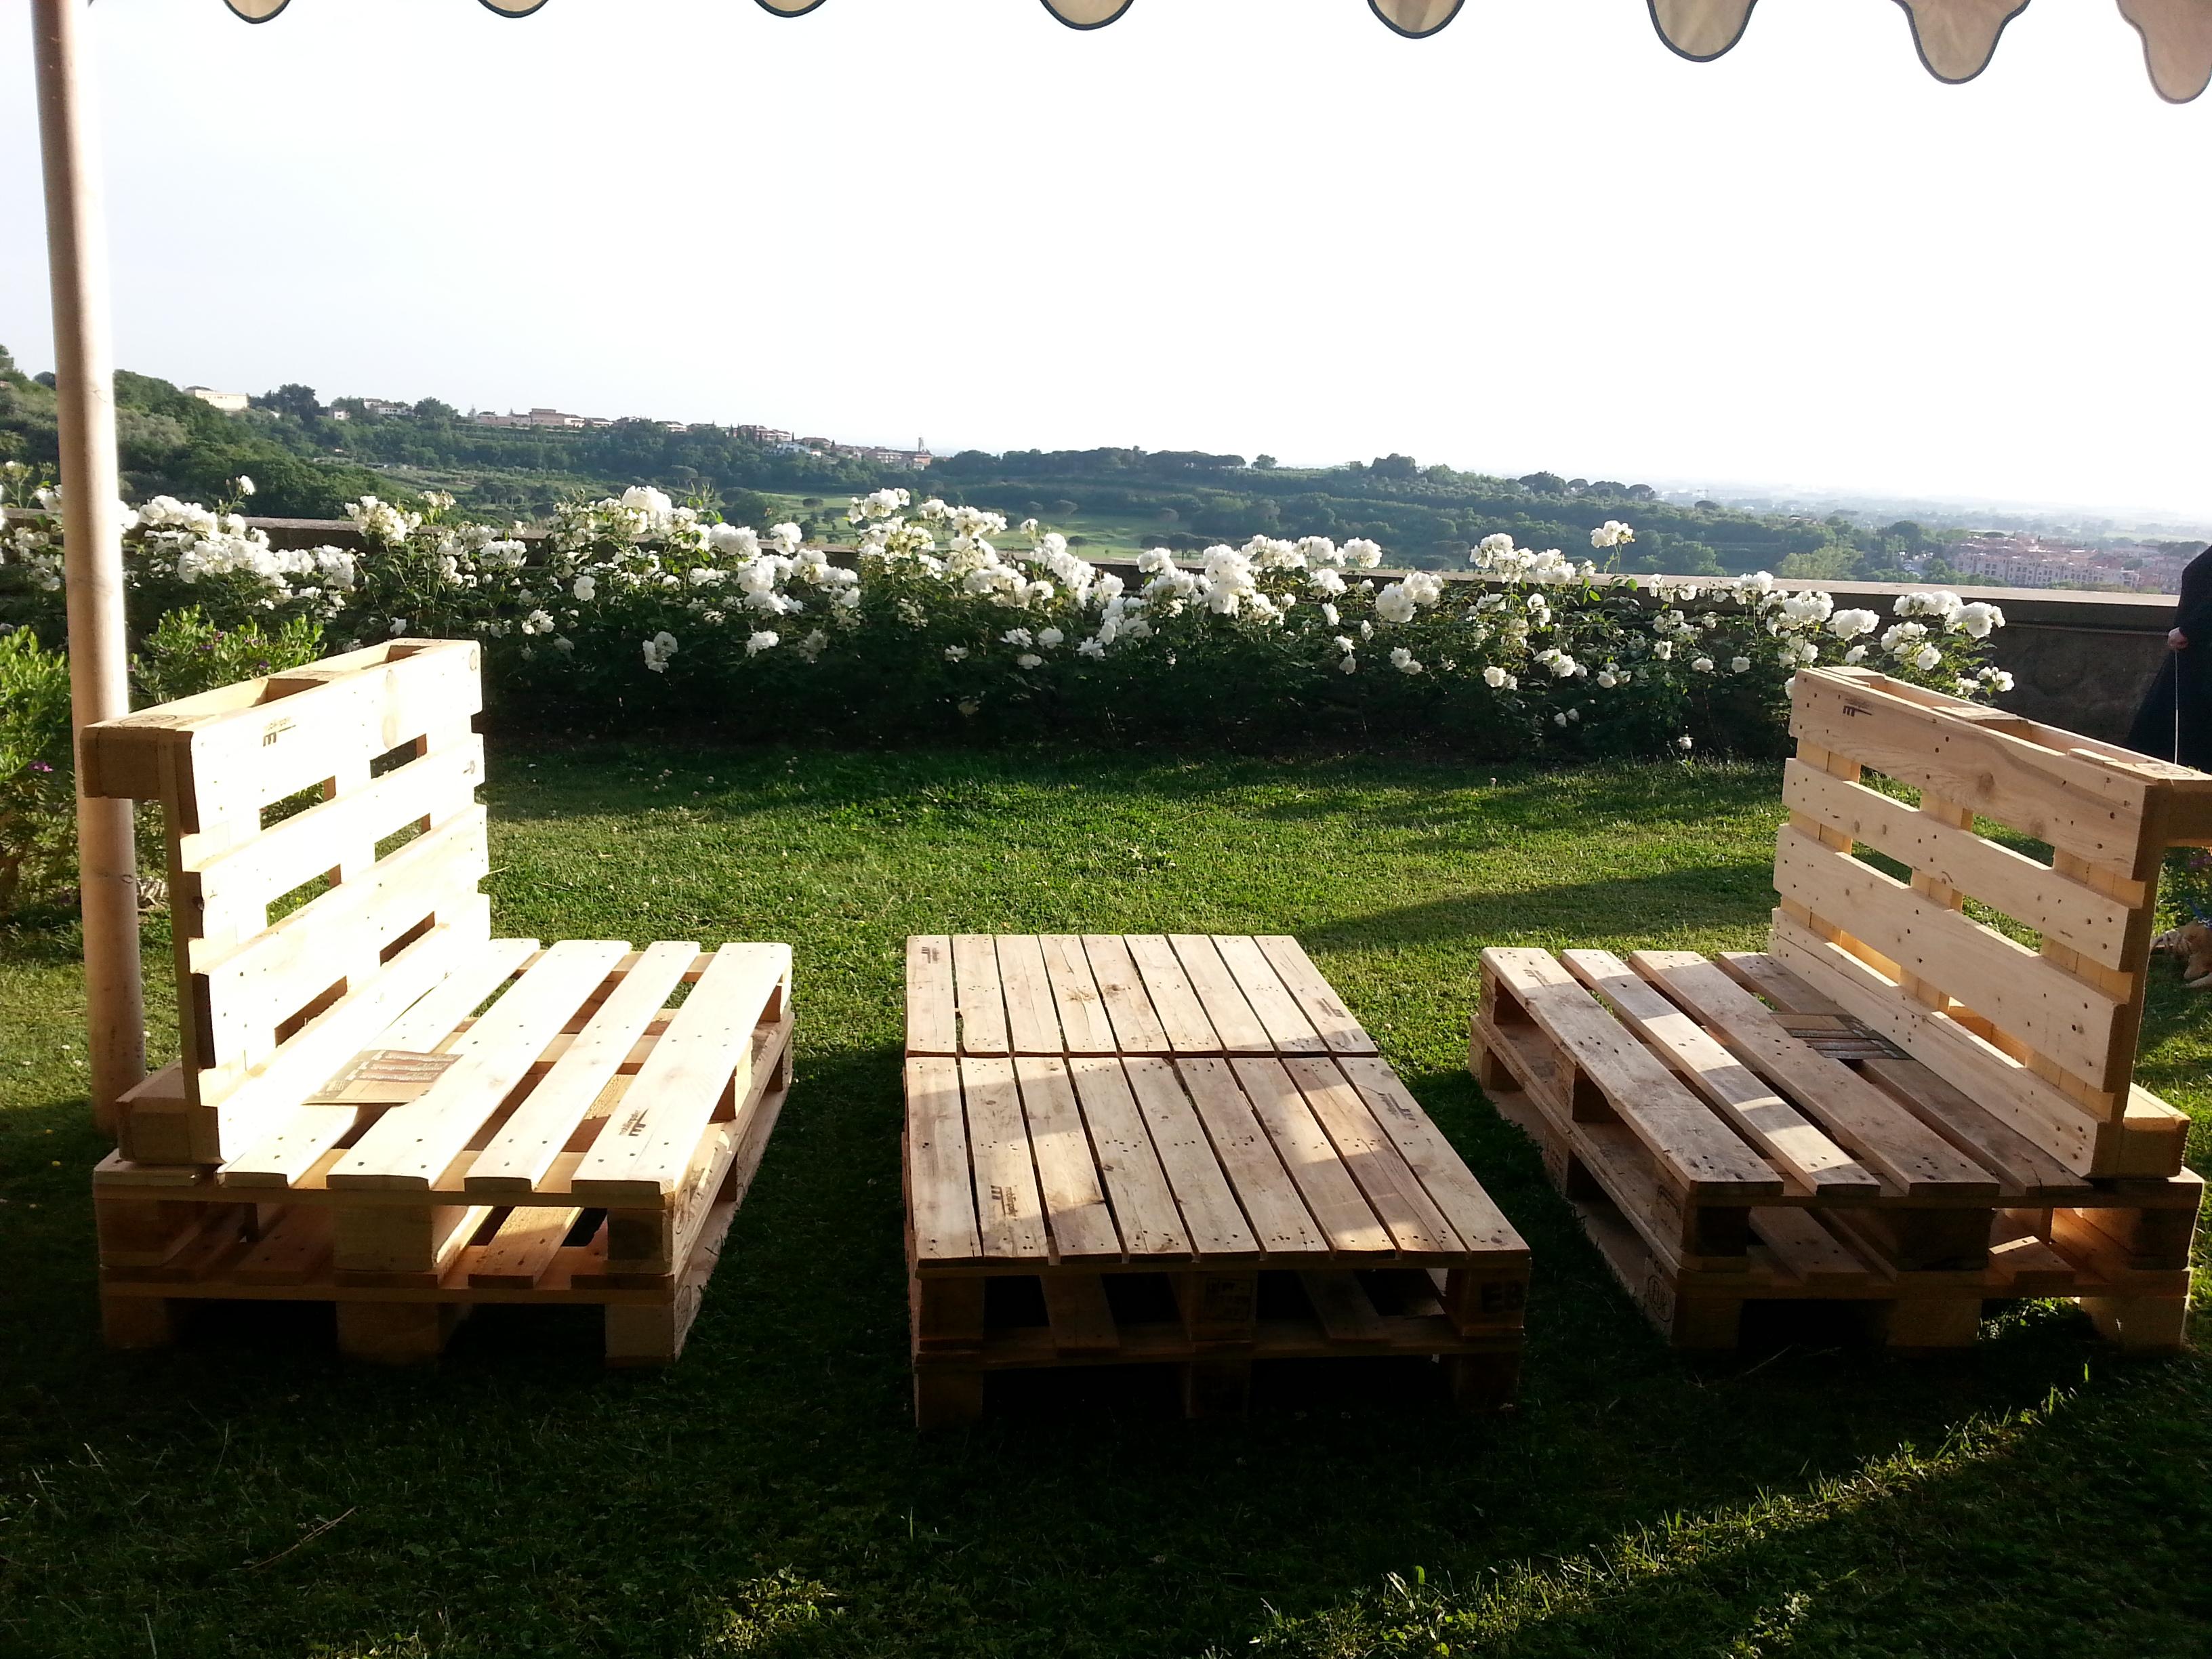 Arredo giardino bancali aw88 regardsdefemmes for Divani in pallet